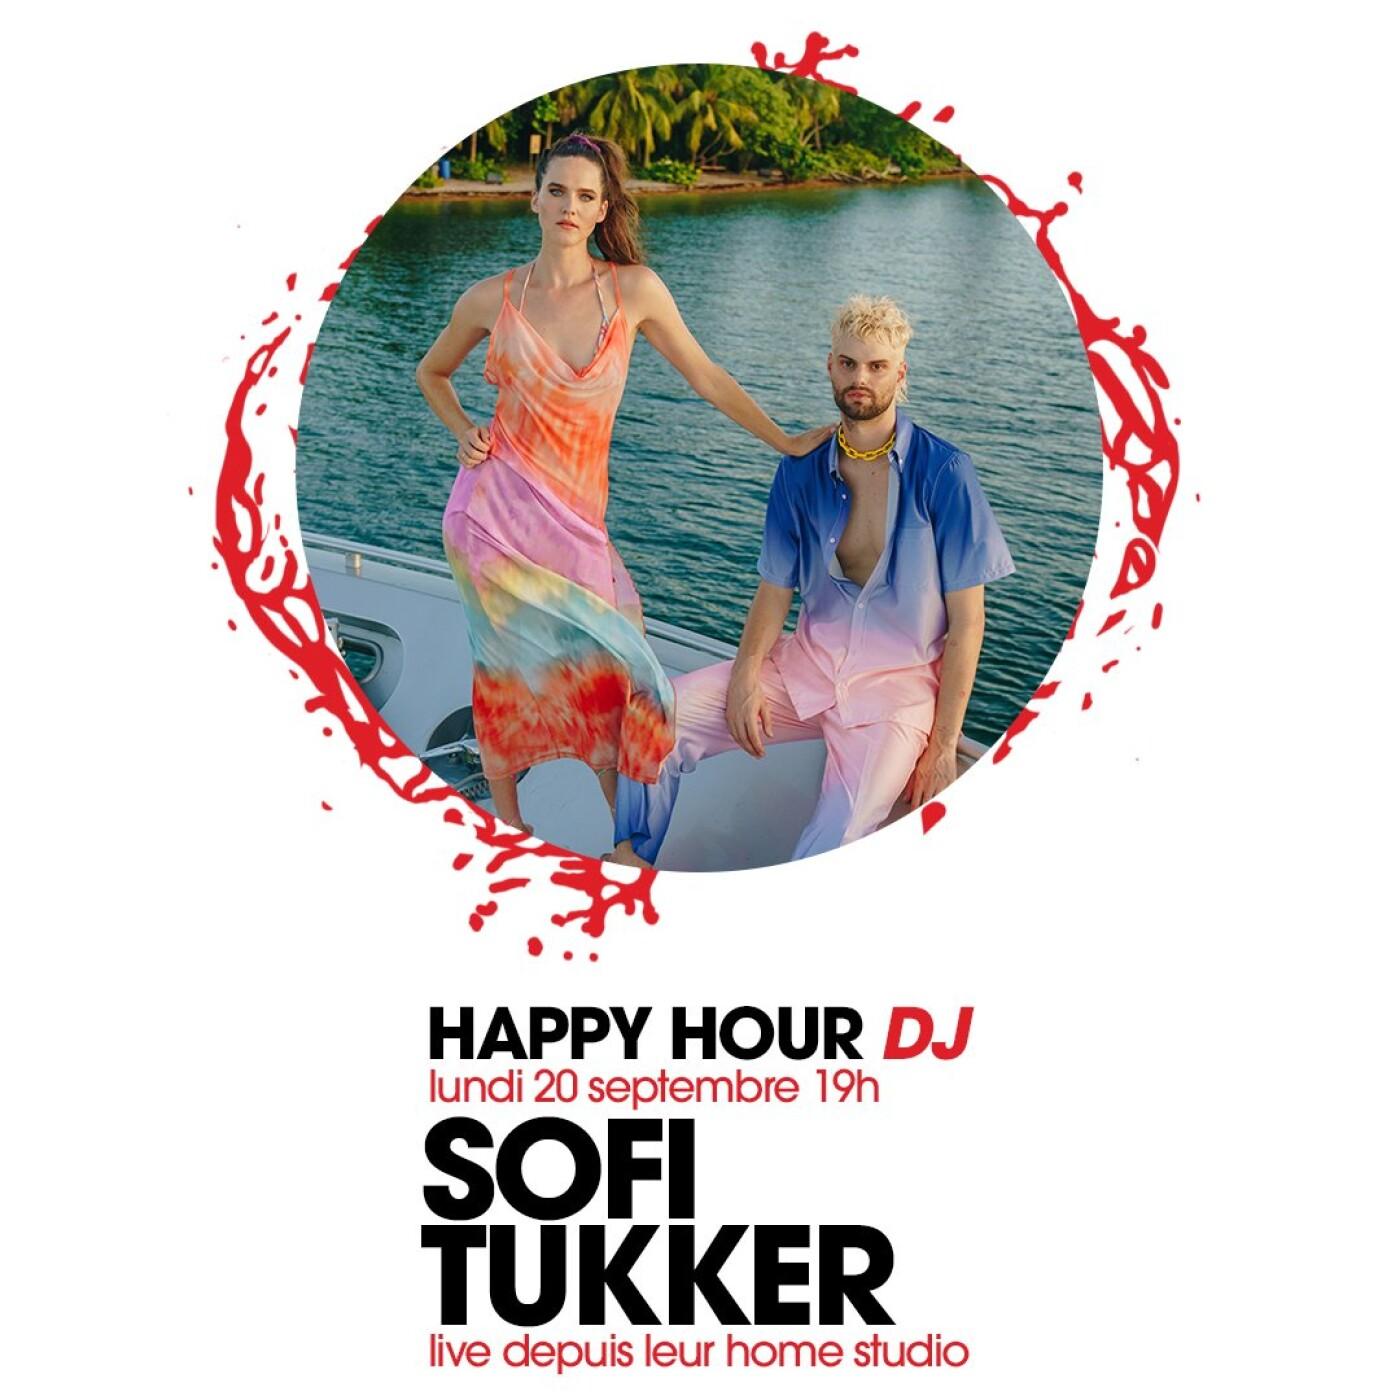 HAPPY HOUR DJ : SOFI TUKKER